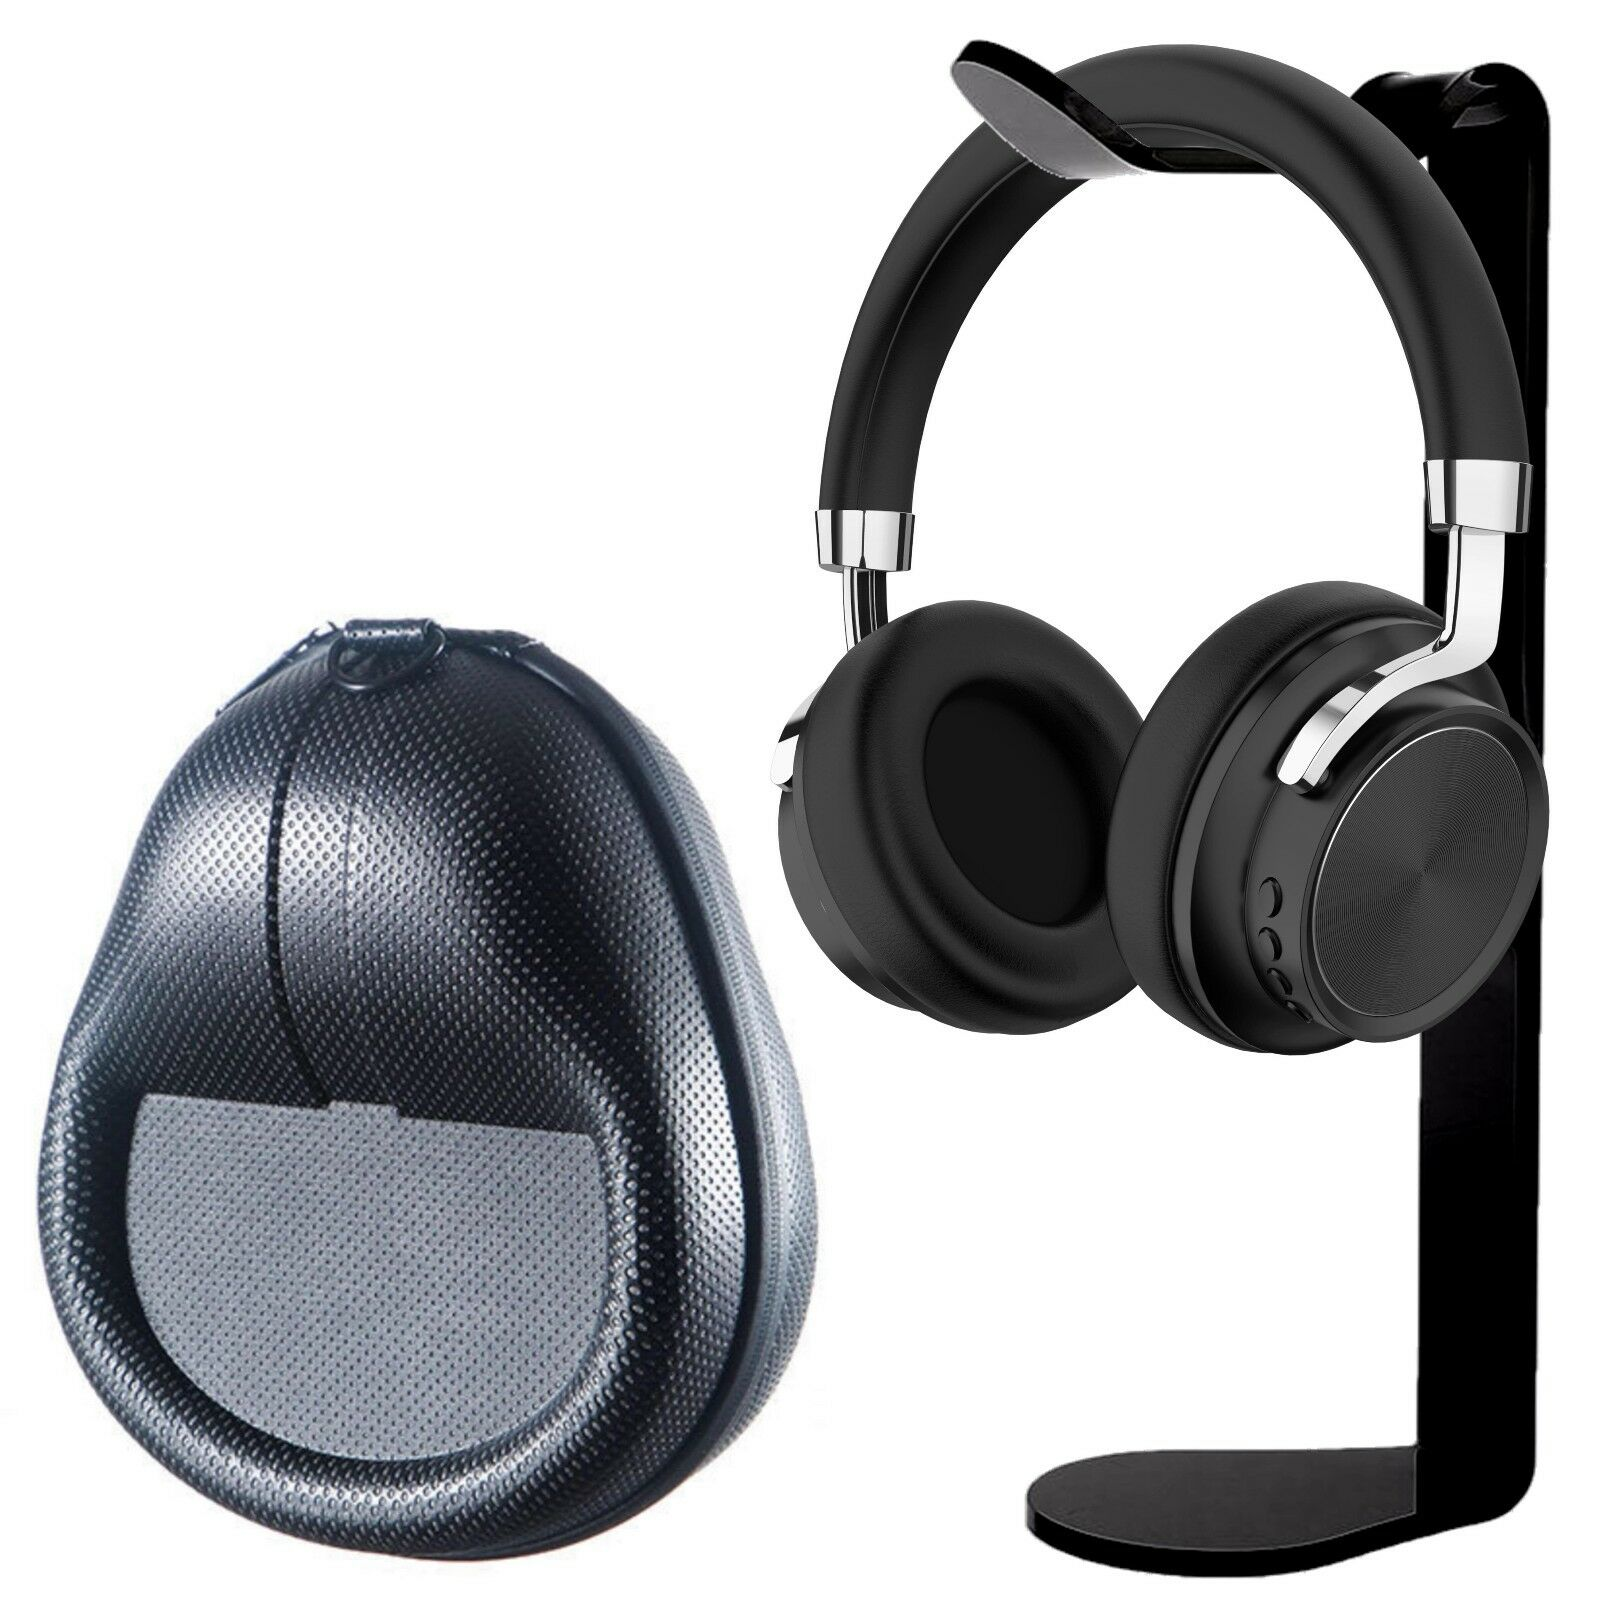 Headphones Bluetooth Wireless for IPHONE Original noziroh Be